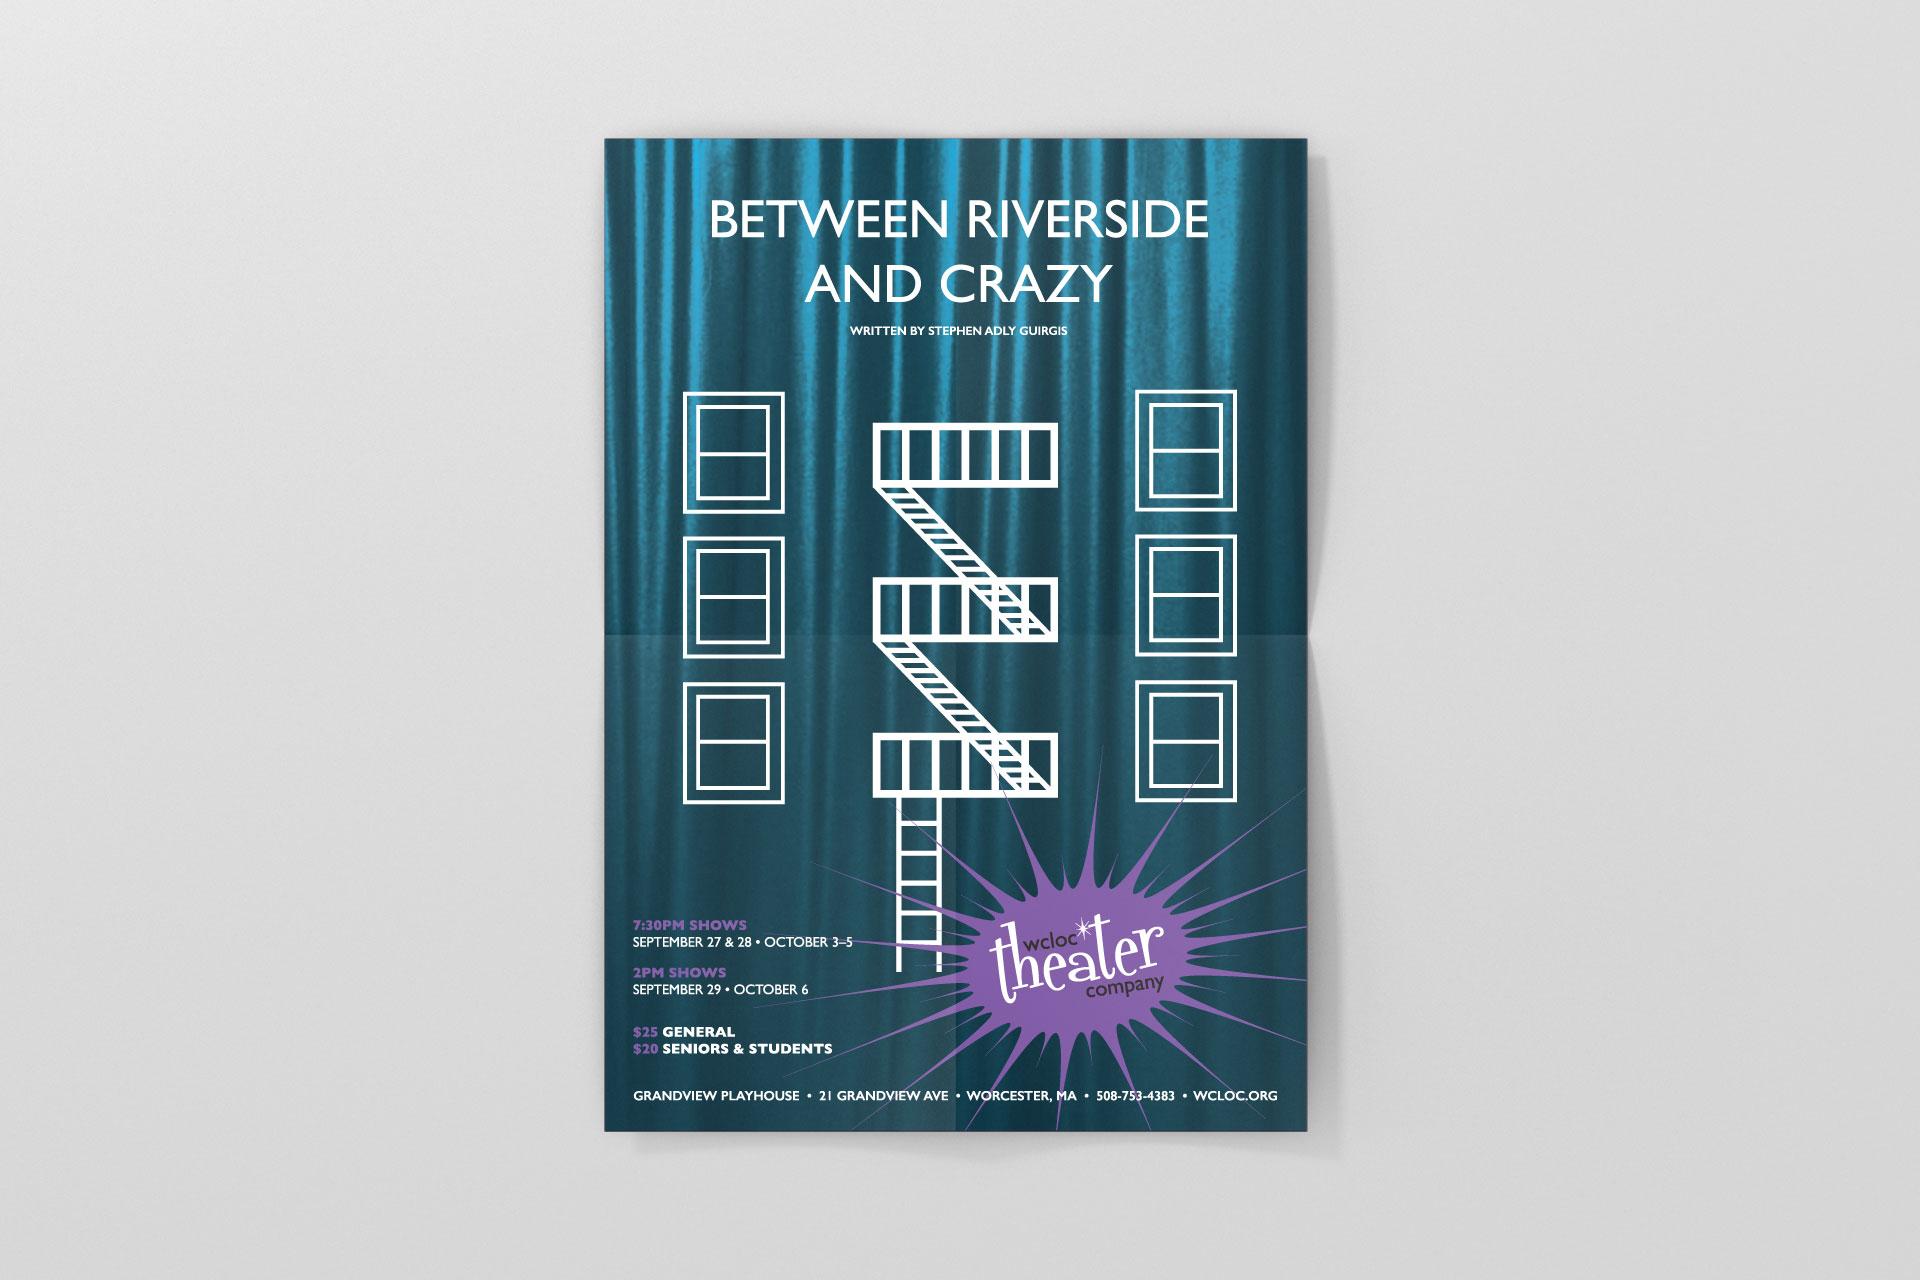 WCLOC Theaterh Poster - Between Riverside and Crazy